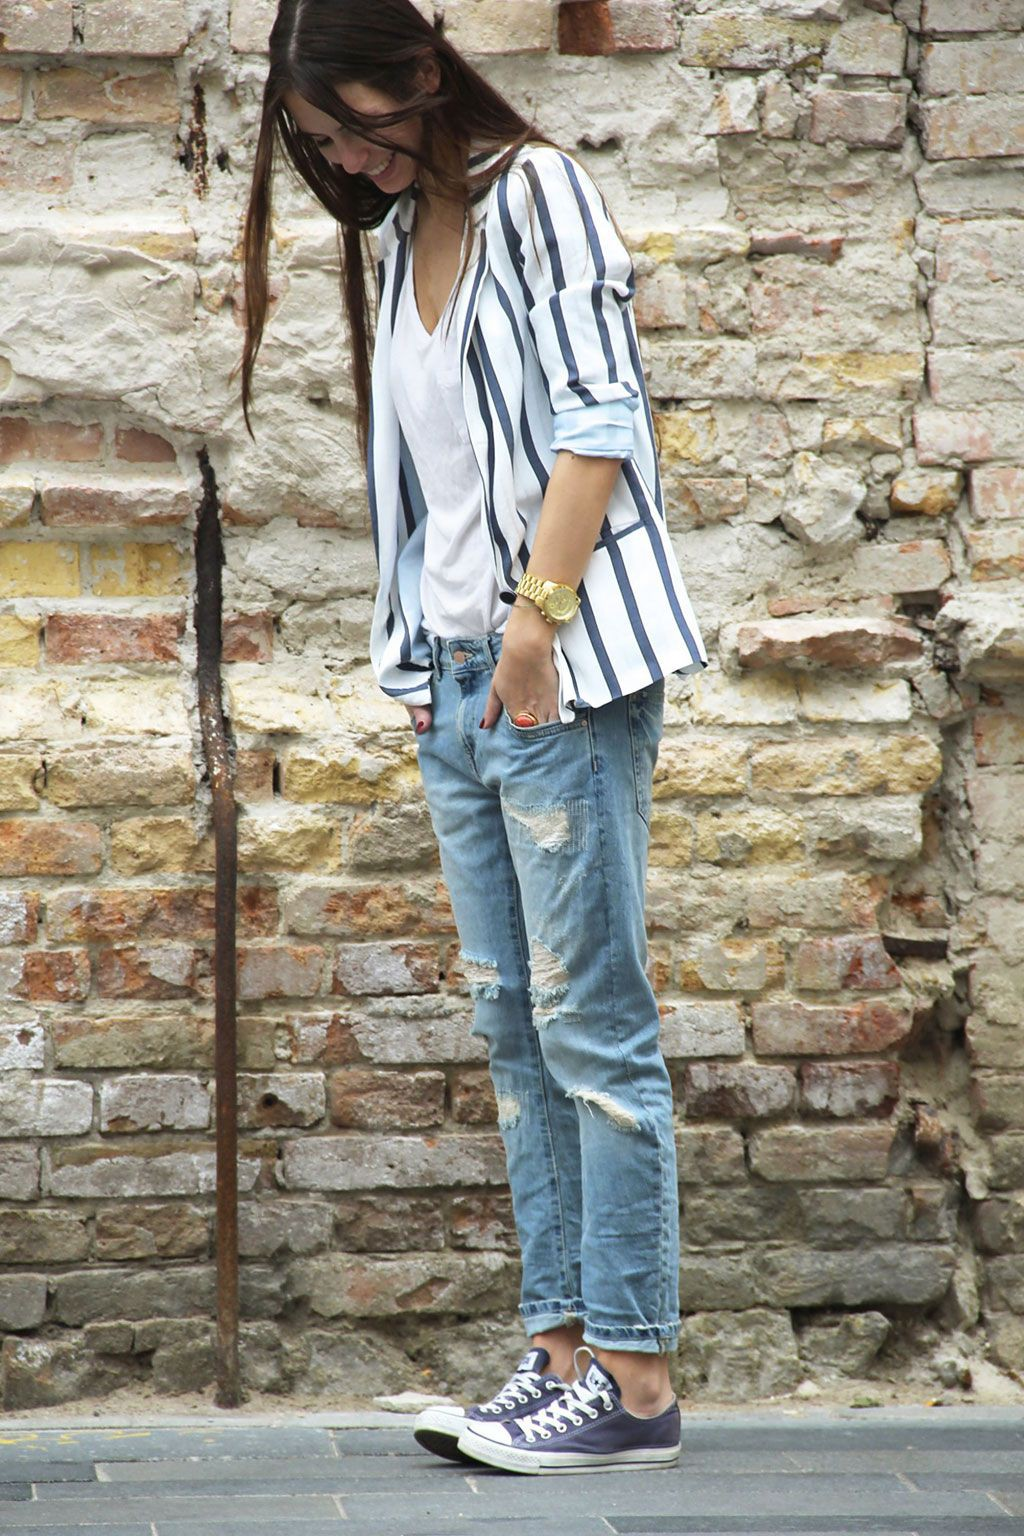 Boyfriend jeans converse outfit, street fashion, t shirt